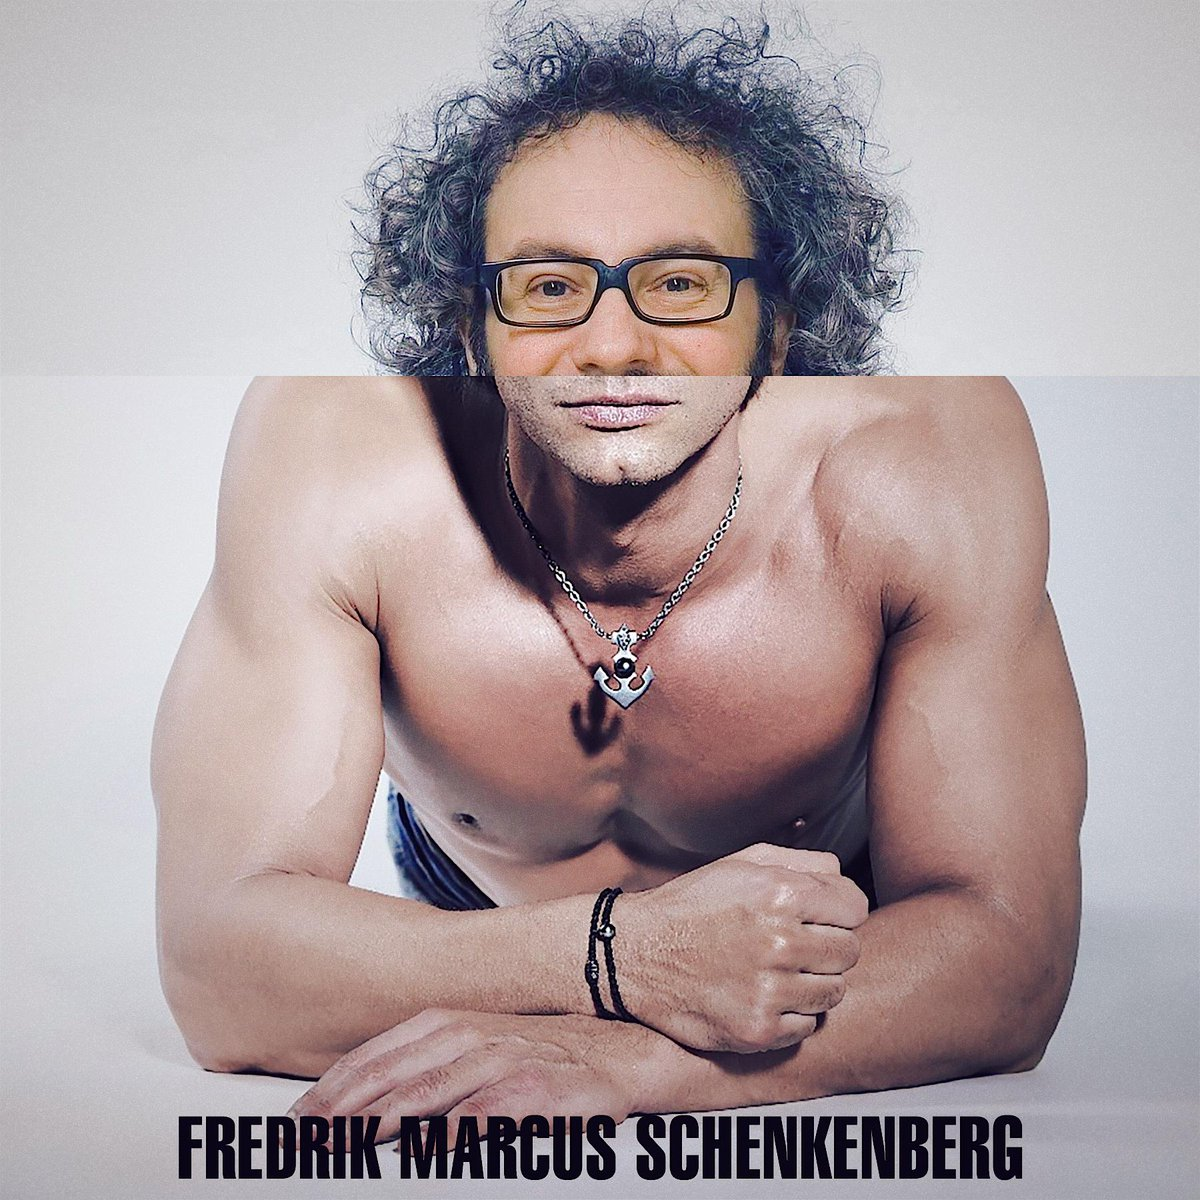 Fredrik marcus on twitter fredrik marcus schenkenberg fredrik marcus on twitter fredrik marcus schenkenberg marcusschenkenb httptcjwcep1cdk altavistaventures Gallery